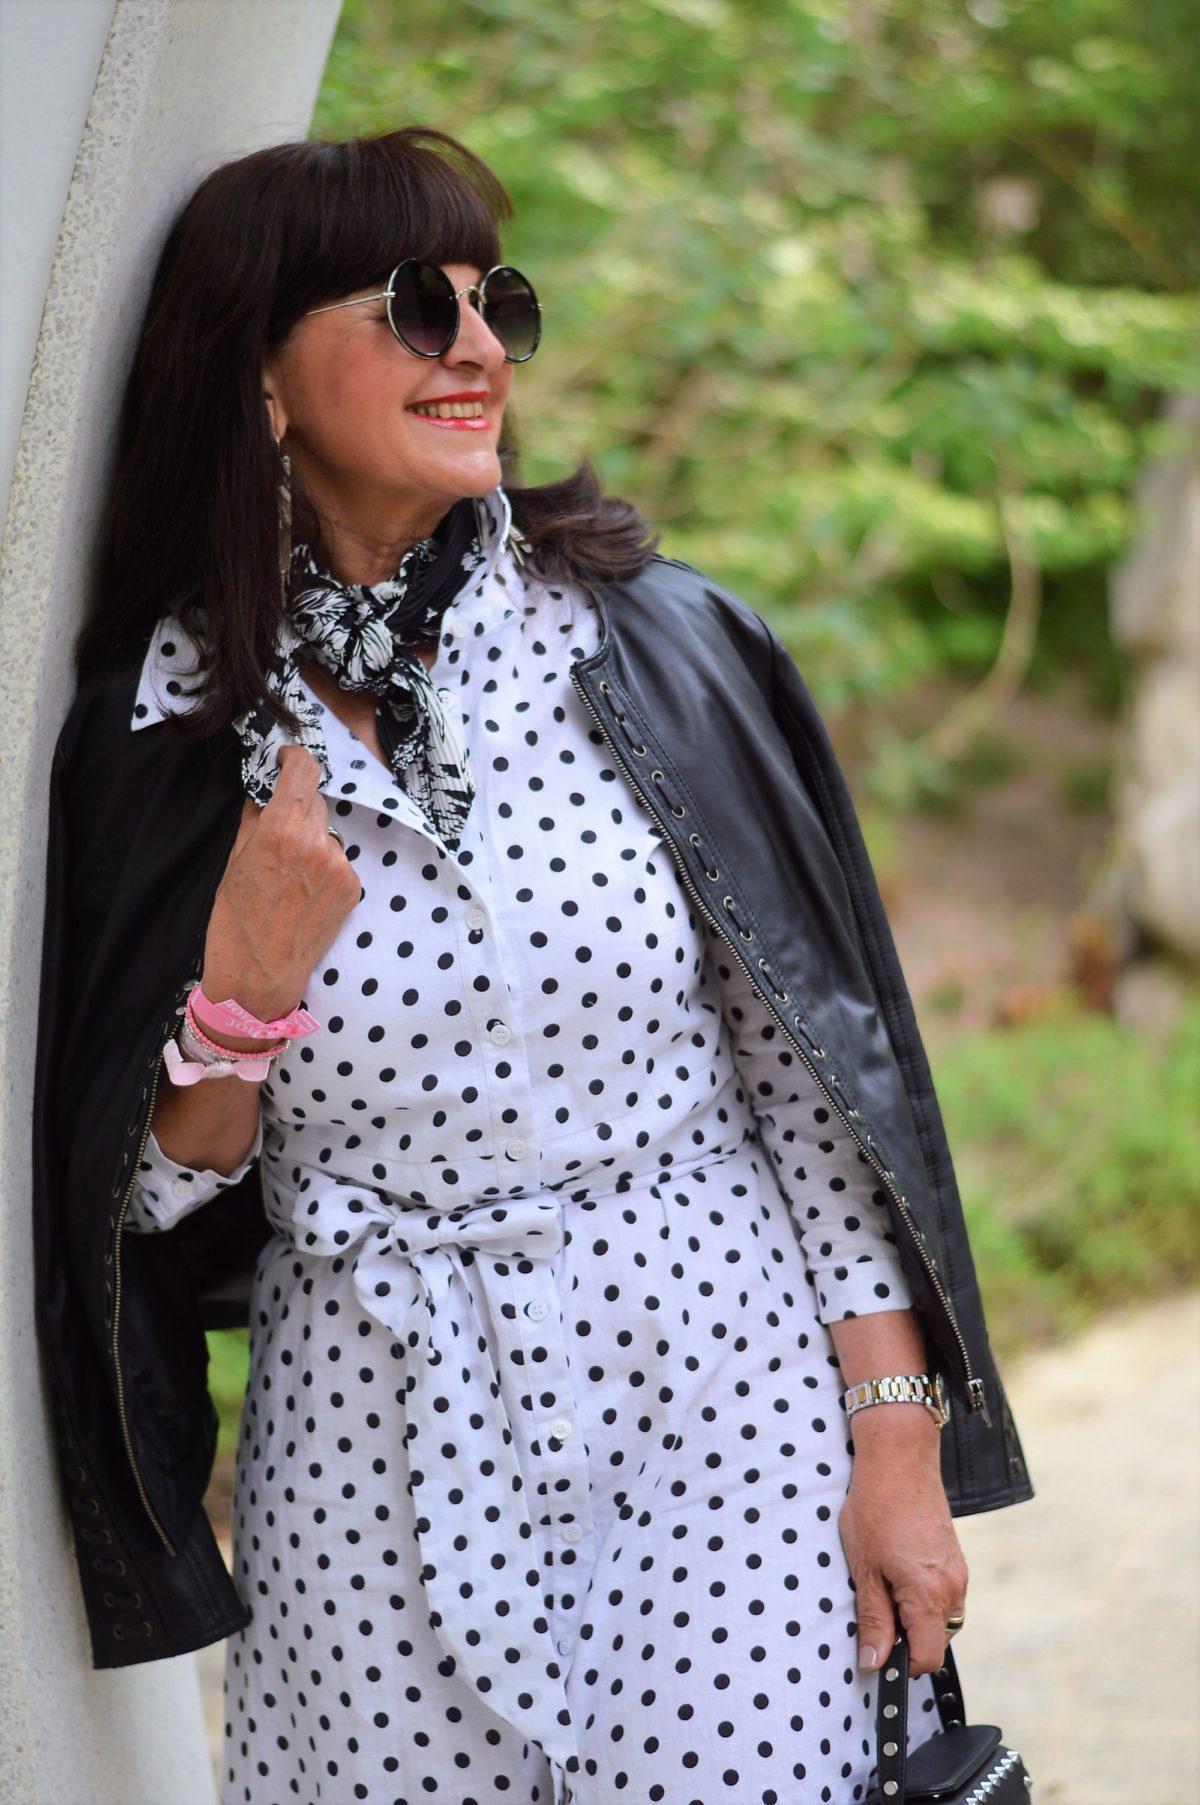 Hemdblusenkleid mit Polka Dots